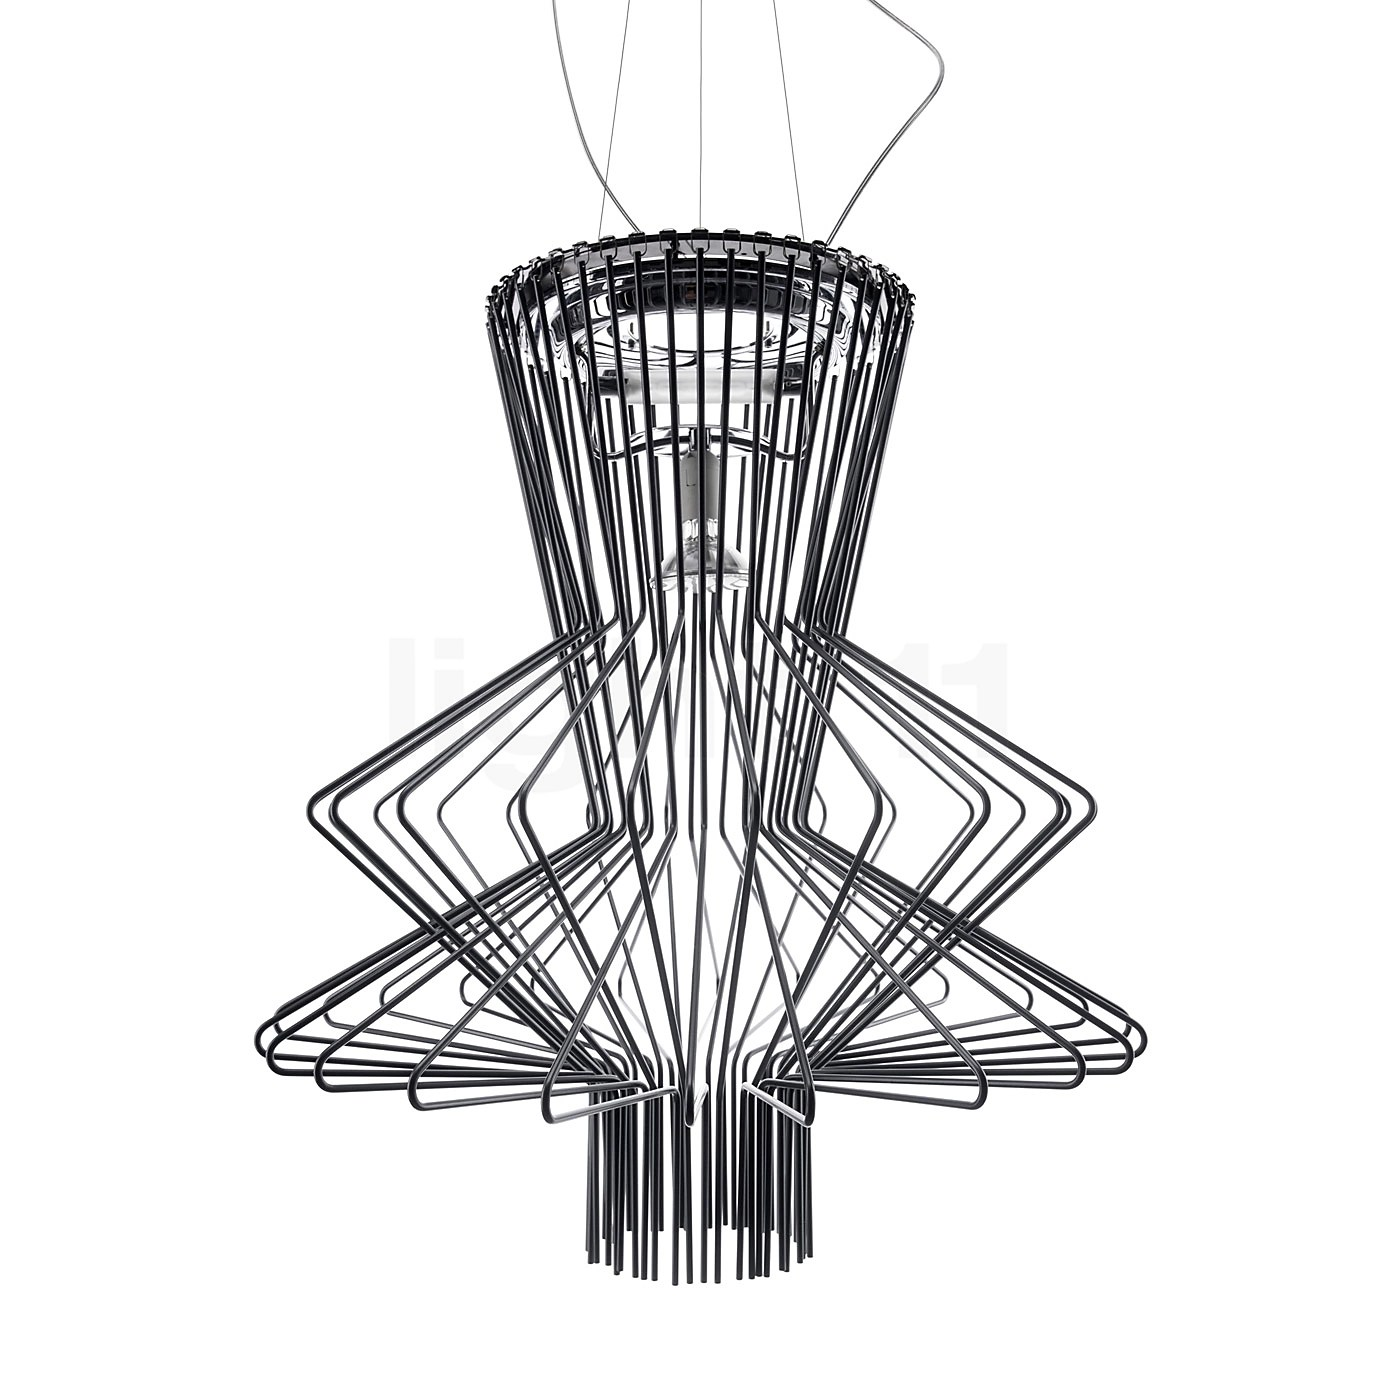 Foscarini Allegro Ritmico Sospensione Pendant Lights Buy